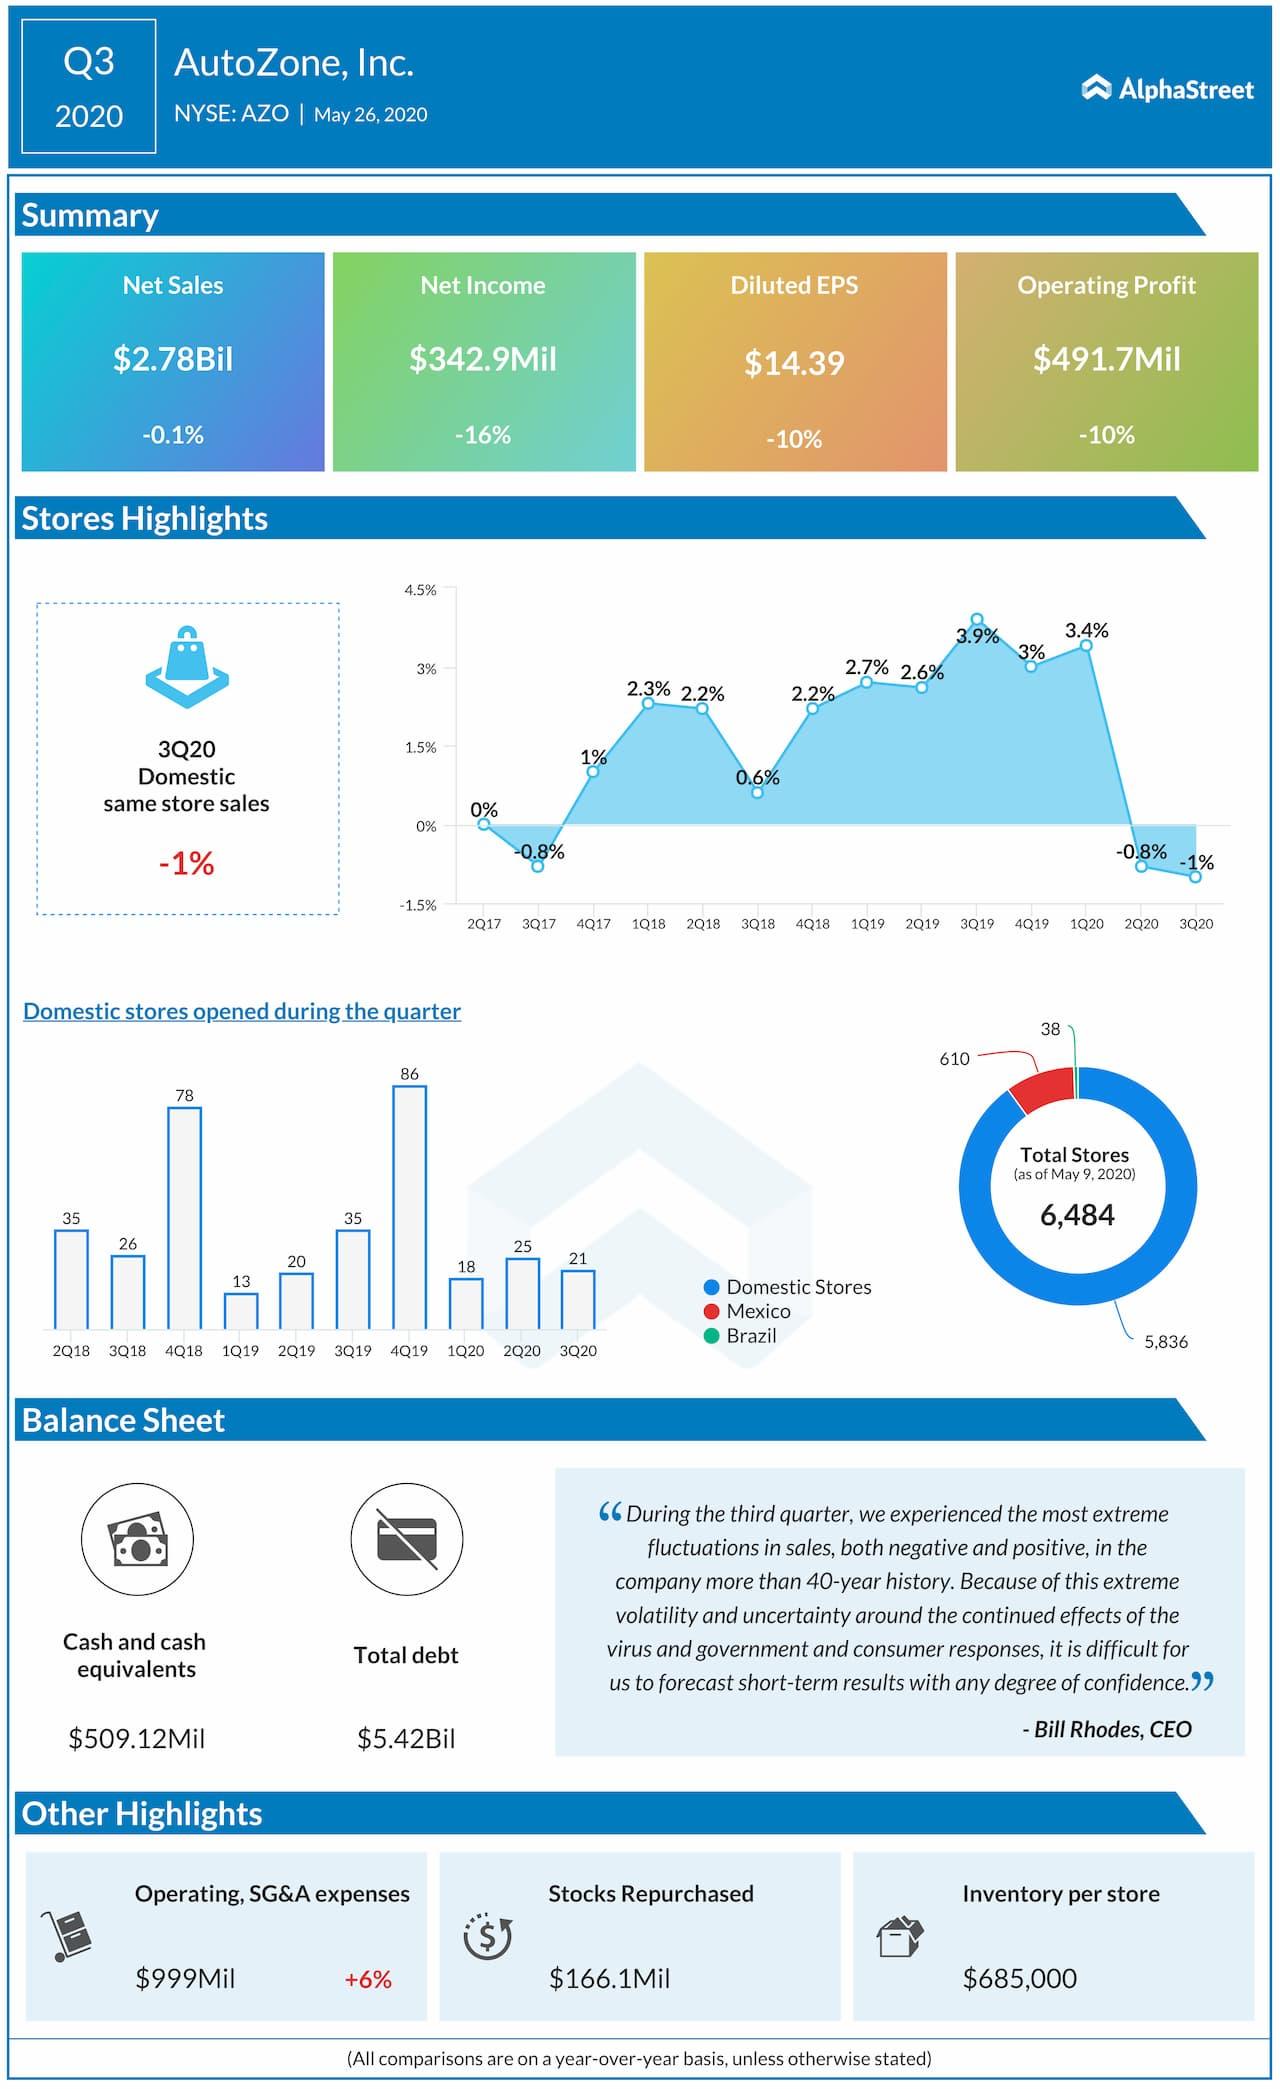 AutoZone (AZO) Q3 2020 earnings review